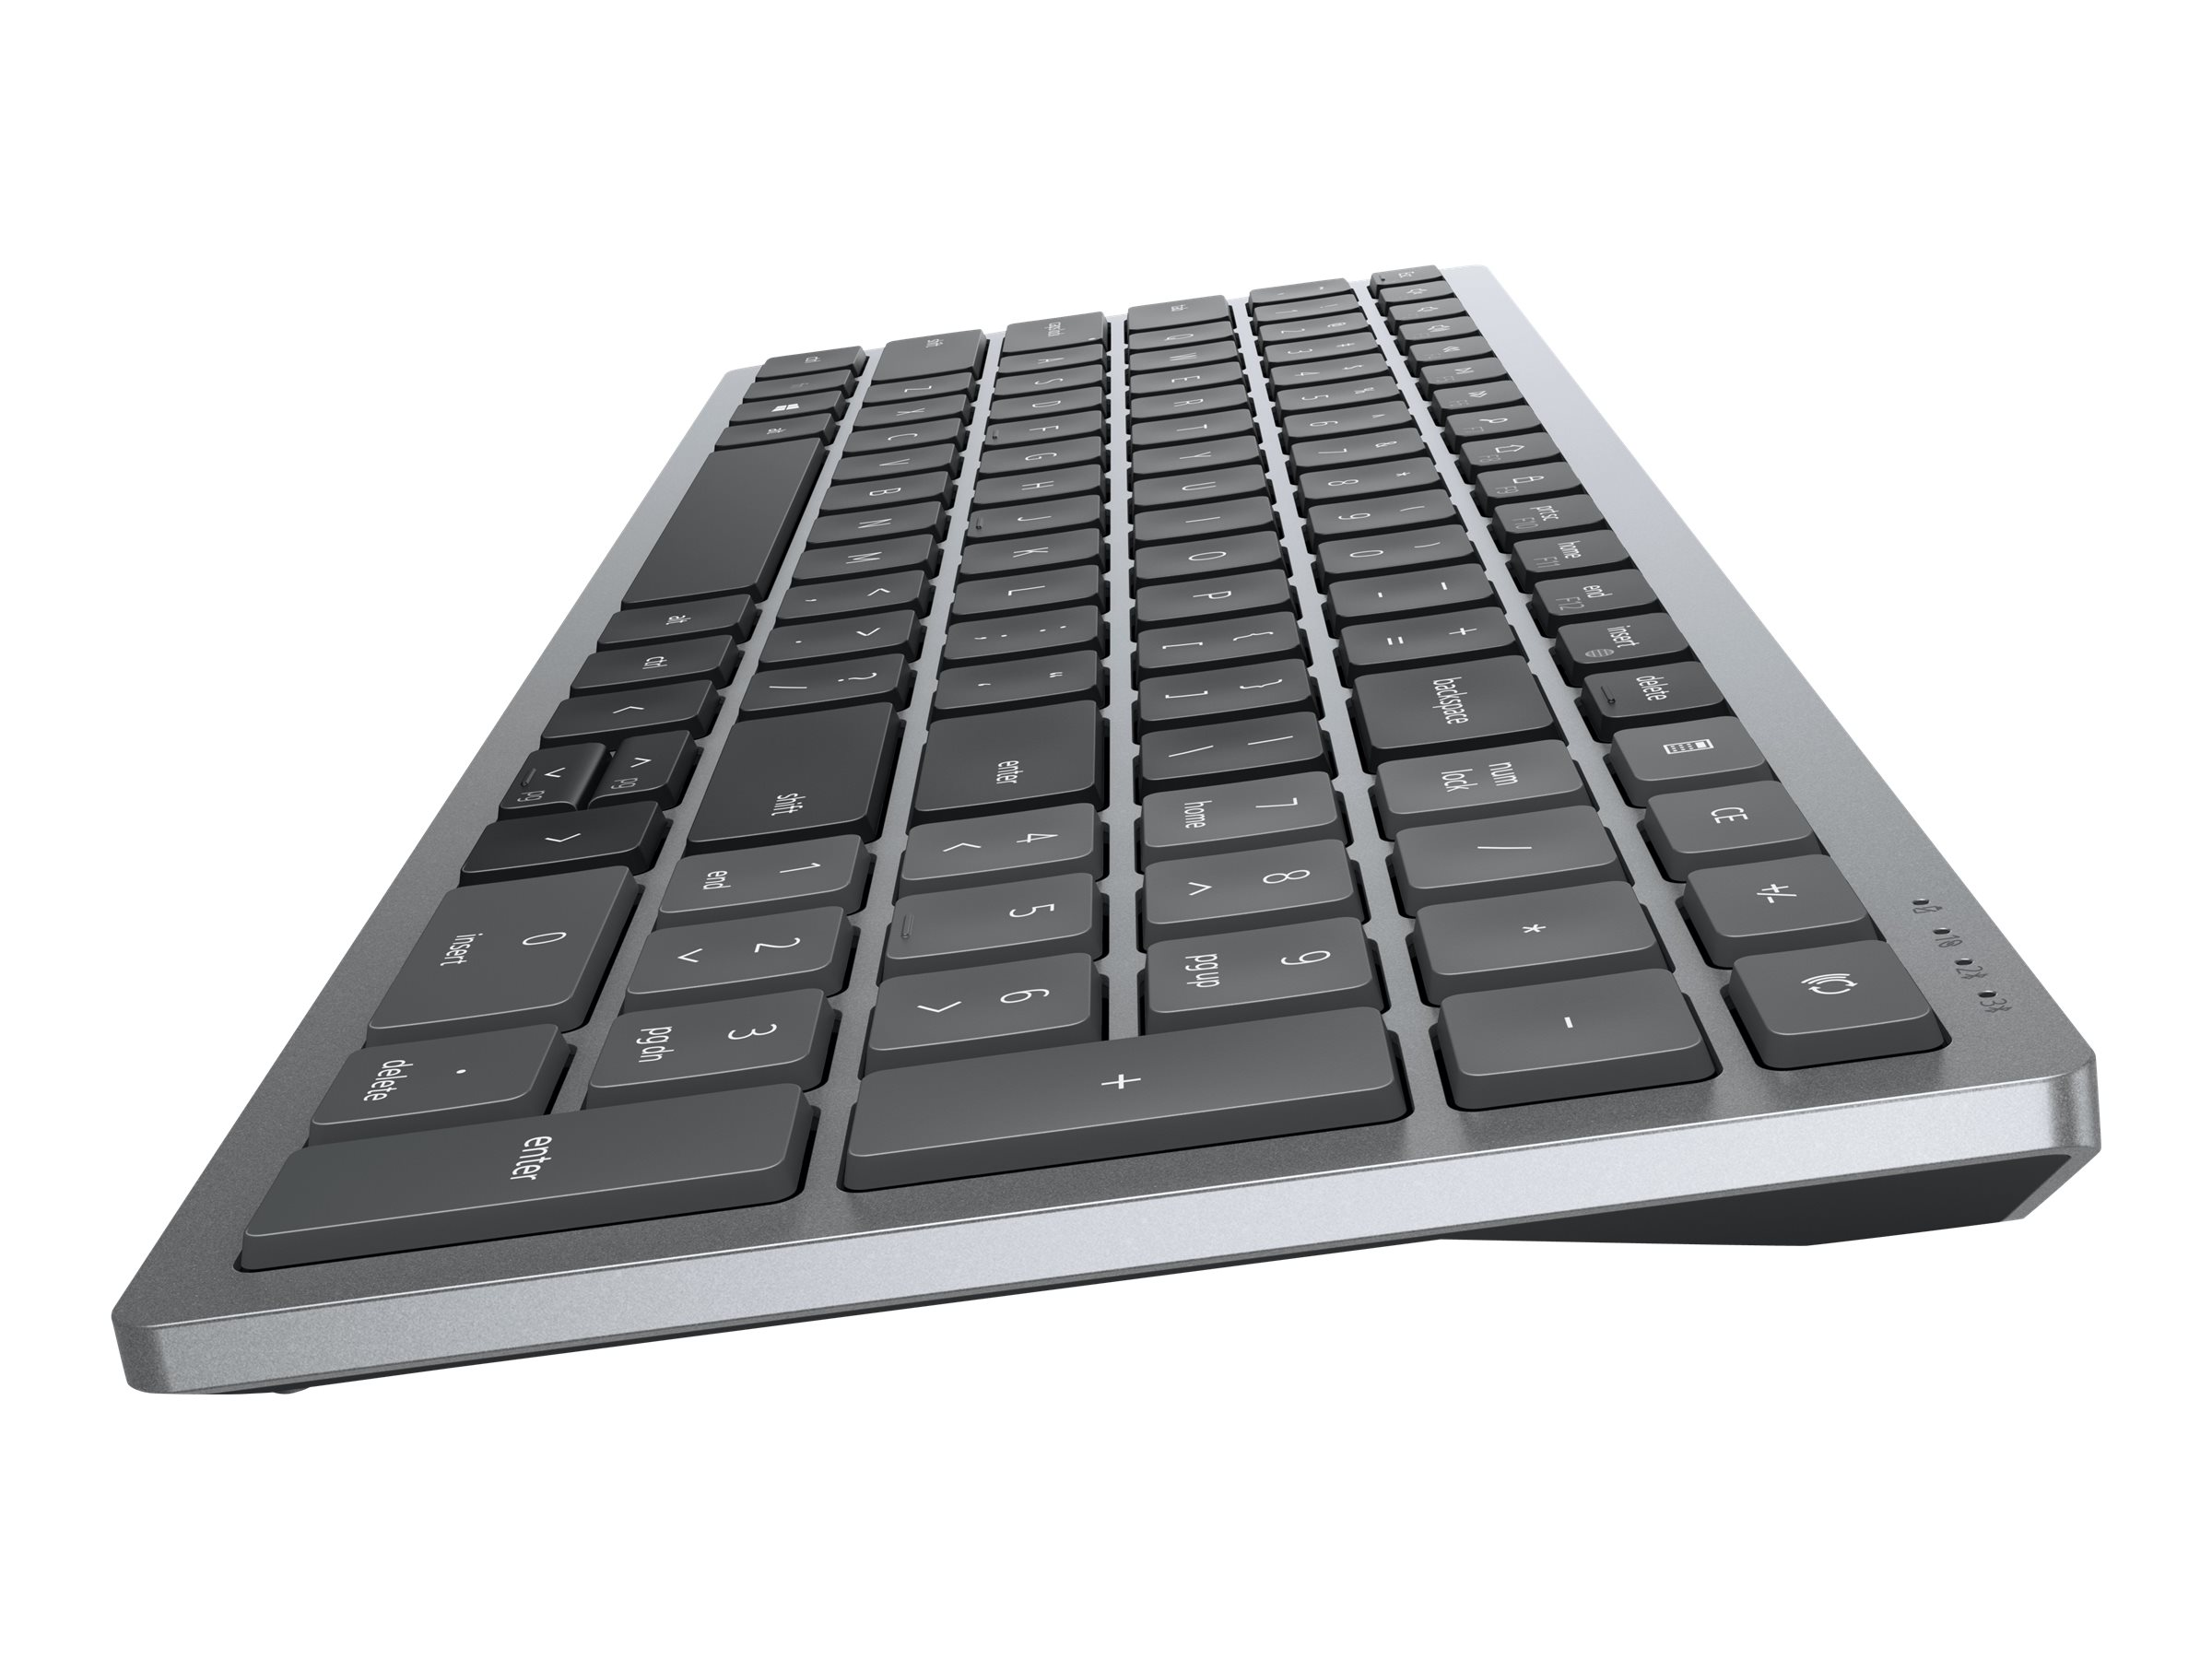 Dell Wireless Keyboard and Mouse KM7120W - Tastatur-und-Maus-Set